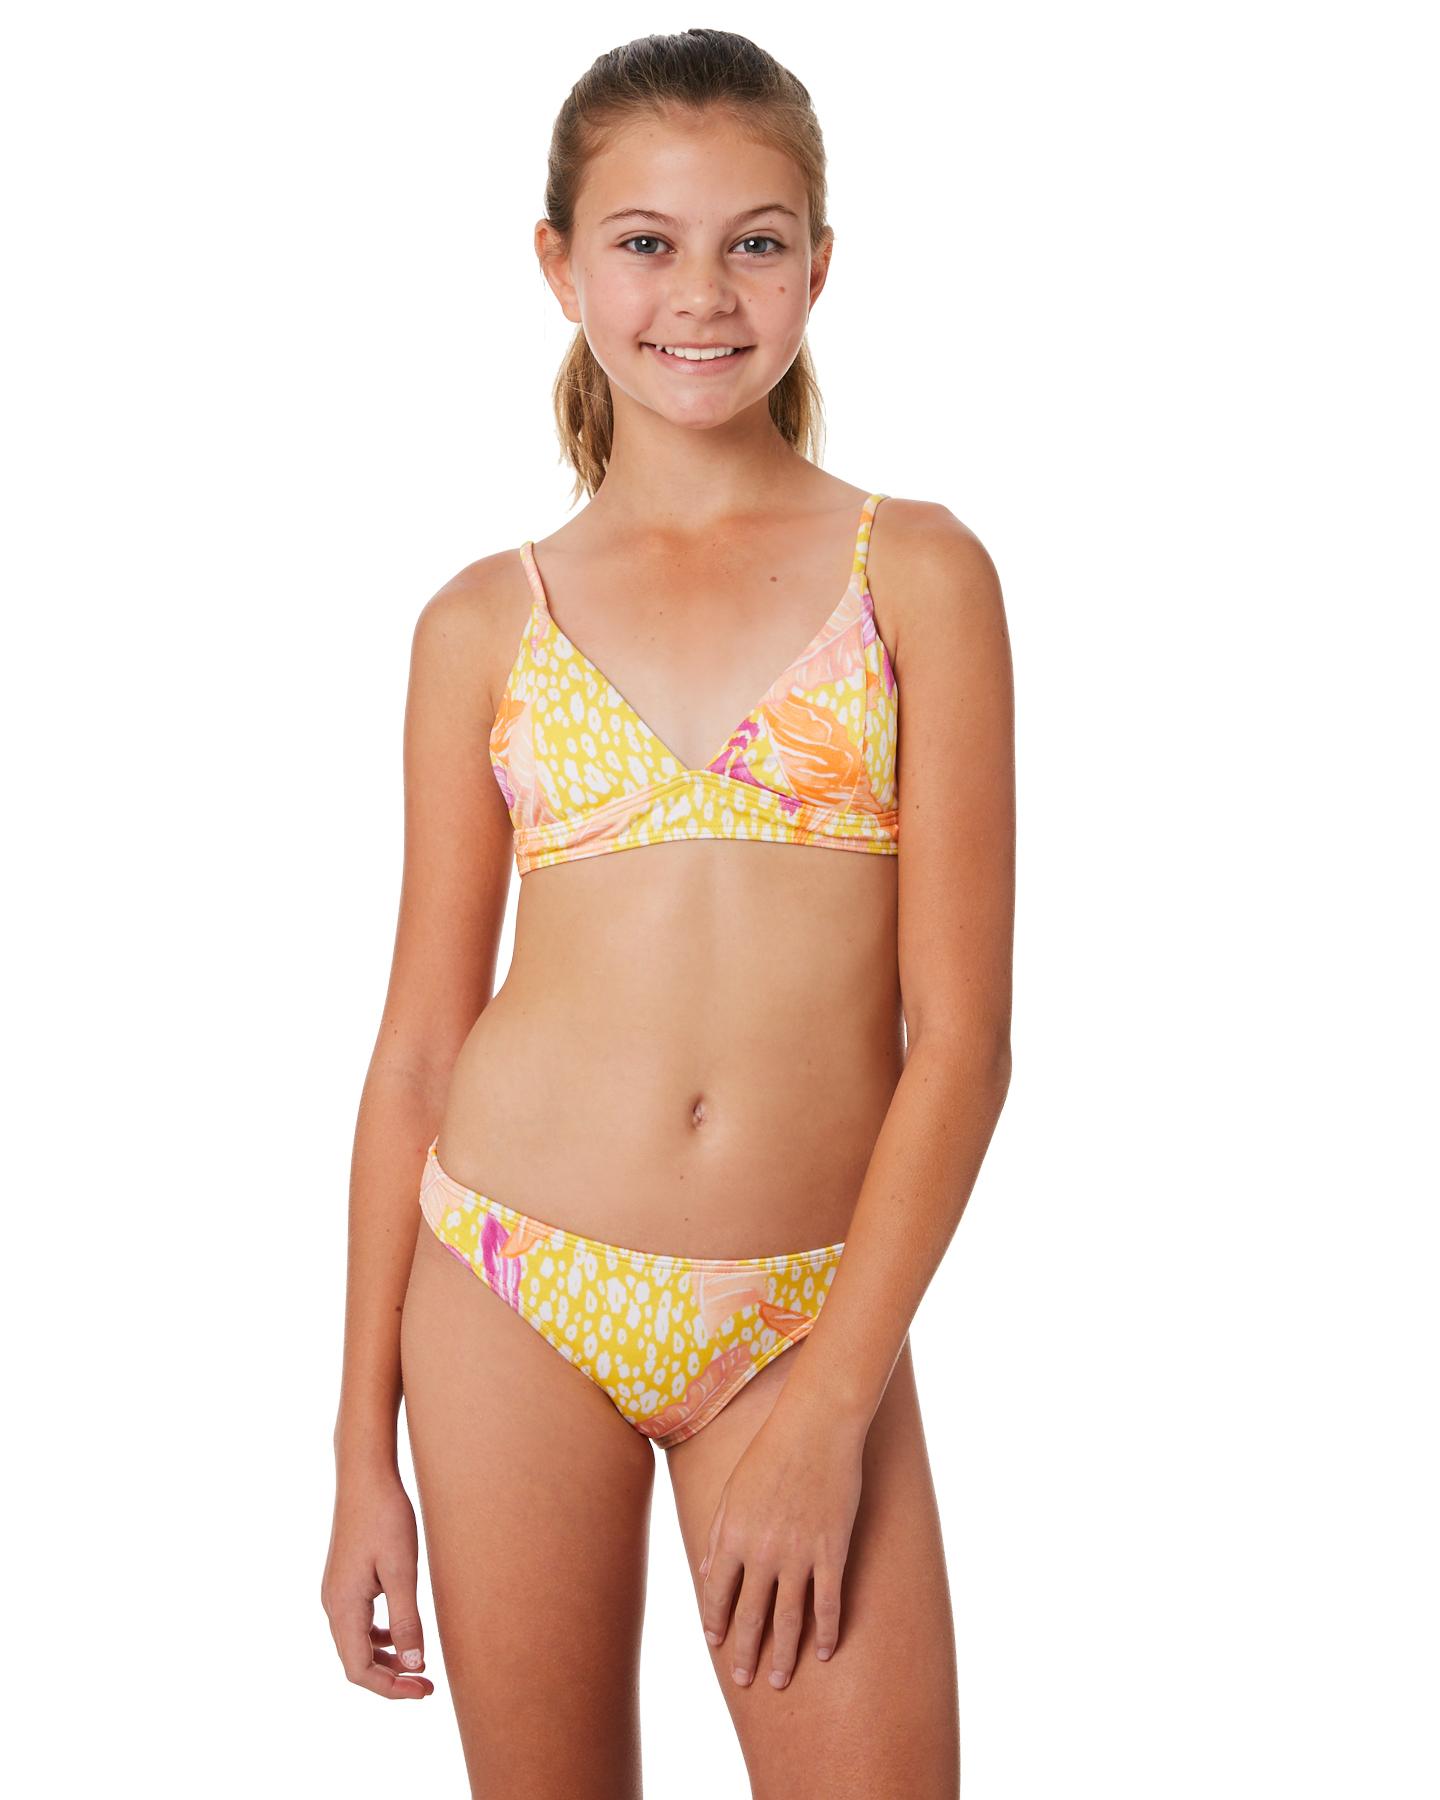 b606d62accc6a Billabong Kids Girls Love Palm Bikini Set - Mimosa | SurfStitch